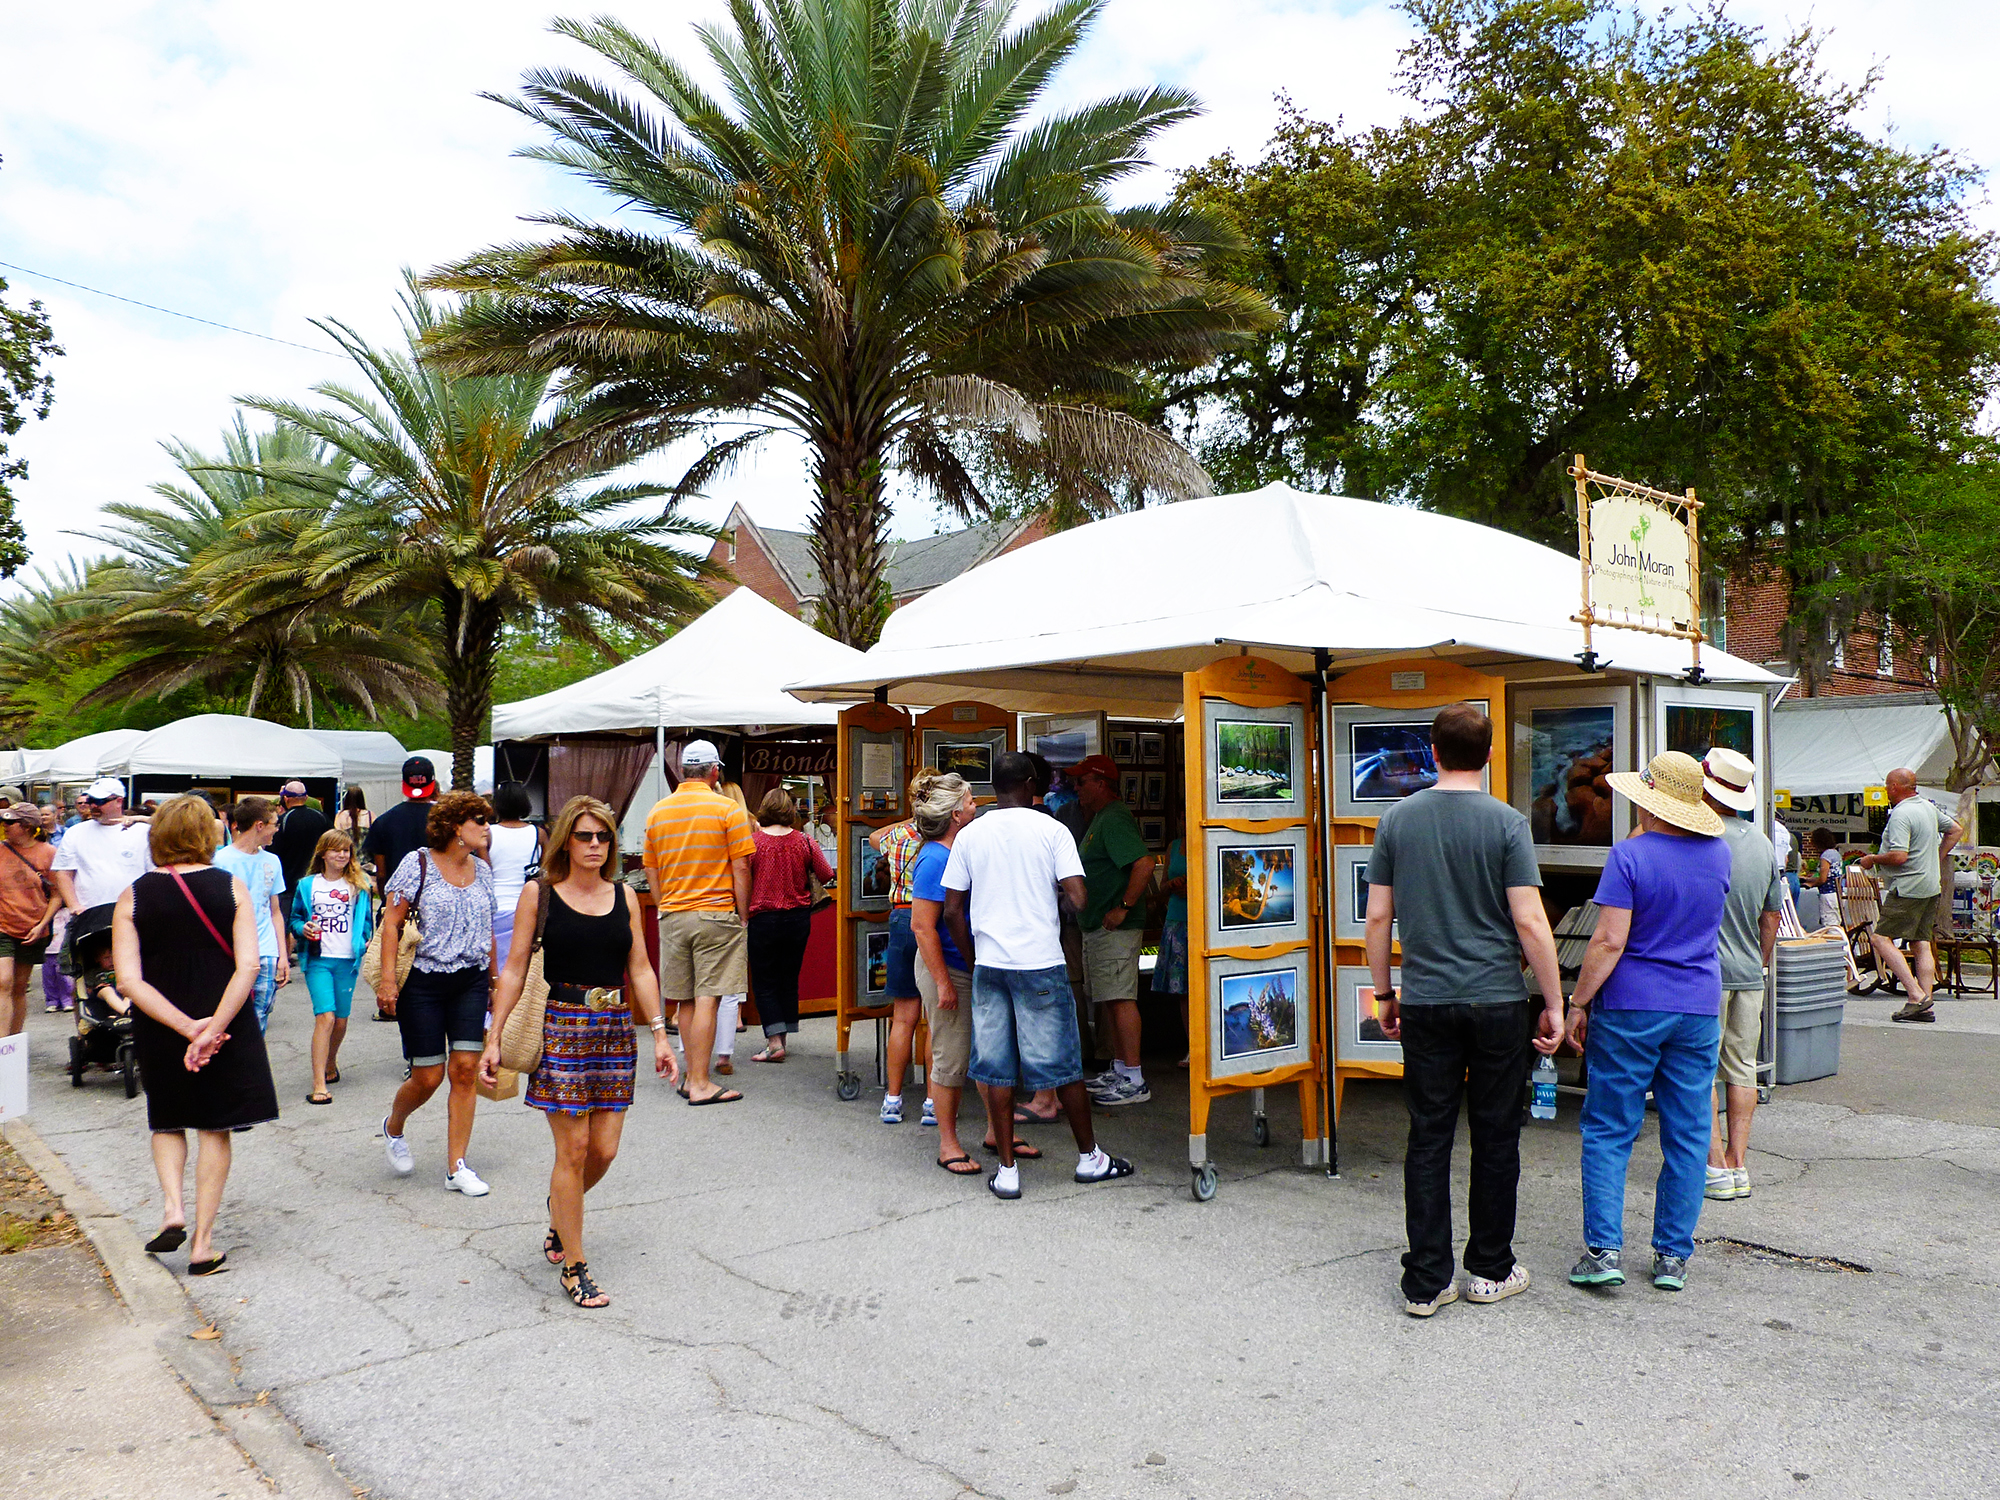 Santa Fe Spring Arts Festival in Gainesville Florida